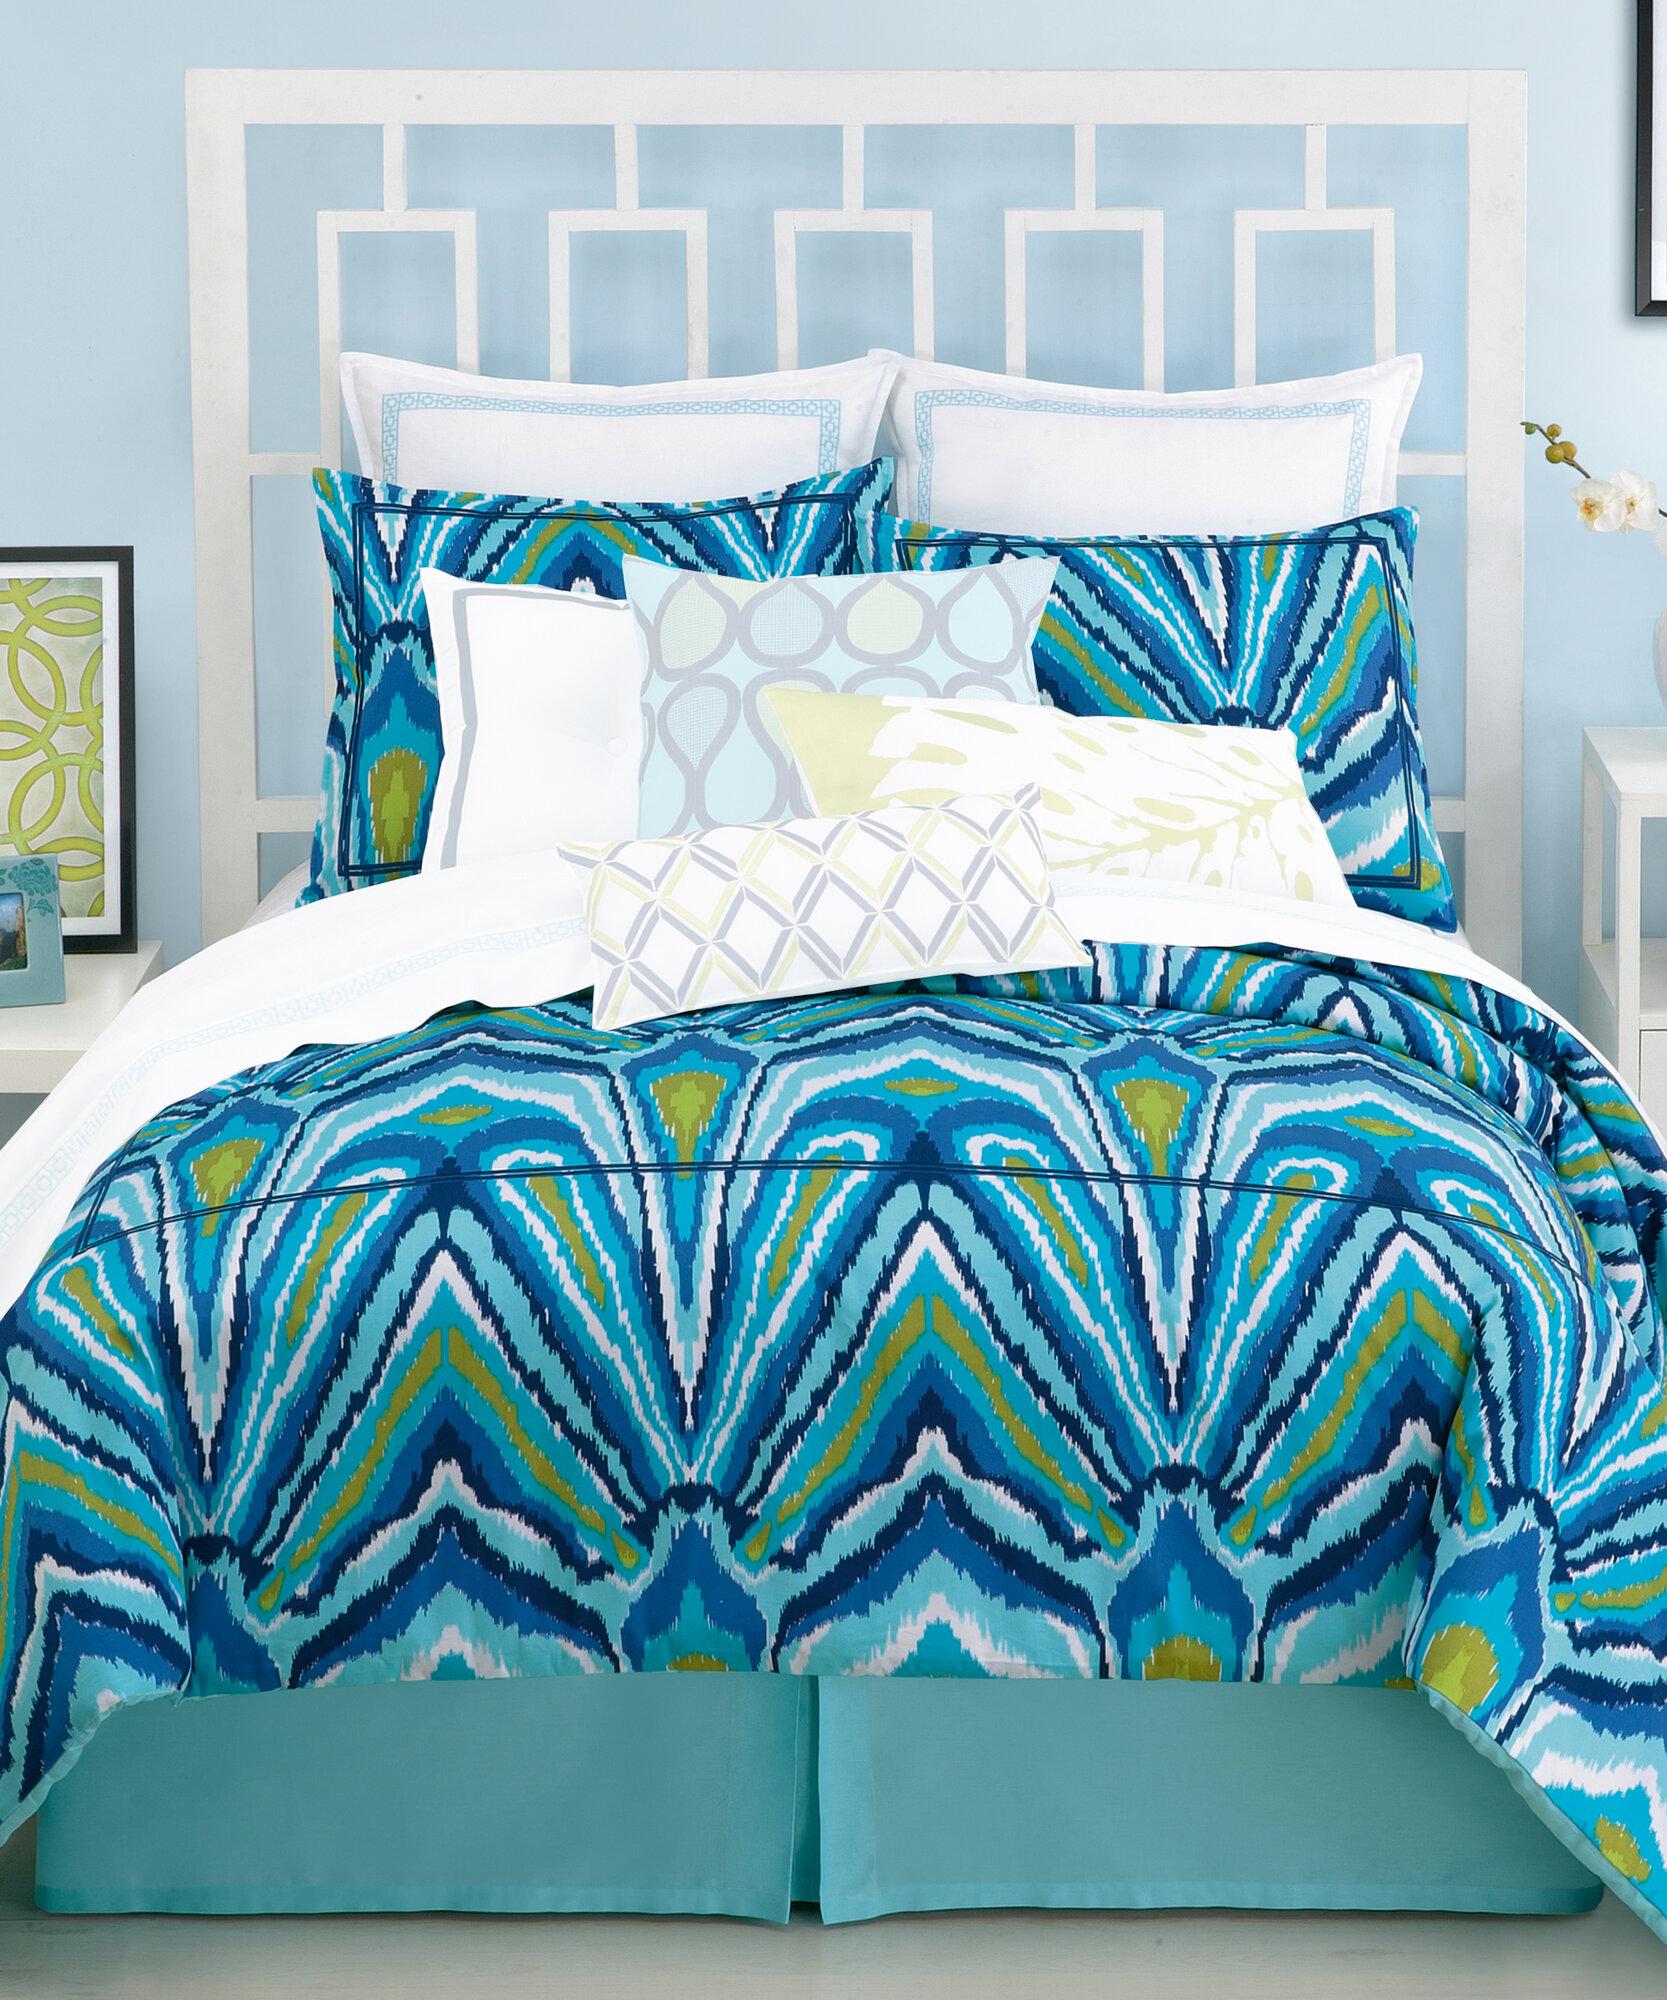 Blue green bedding sets - Blue and green bedding sets ...